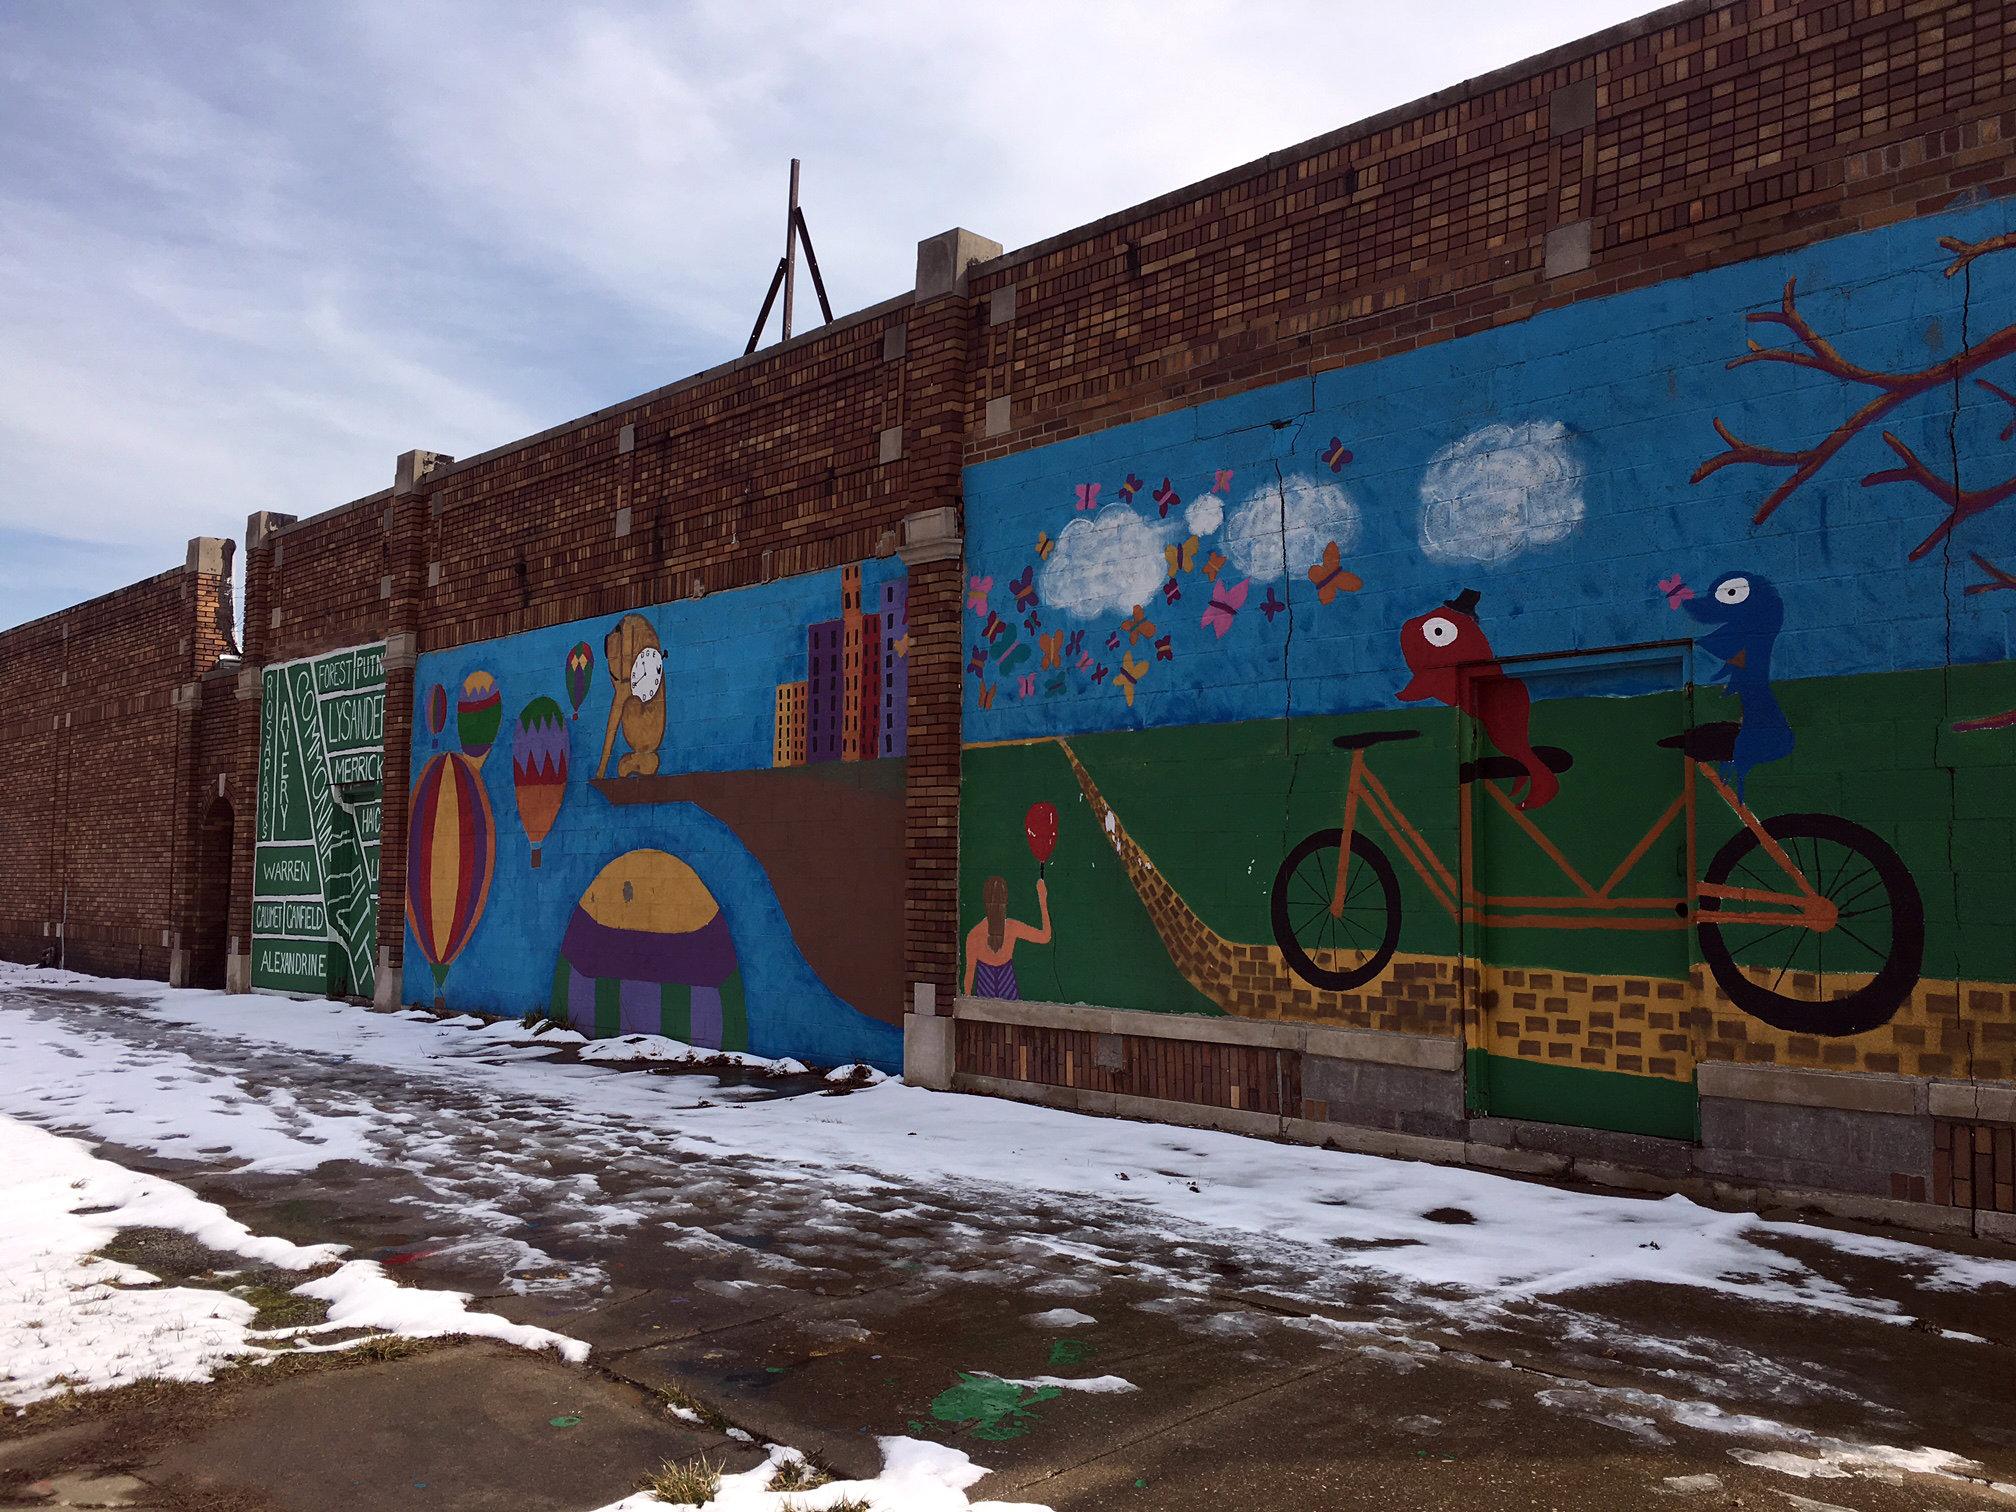 café-bike shop combo wheeling into woodbridge in 2017 - eater detroit